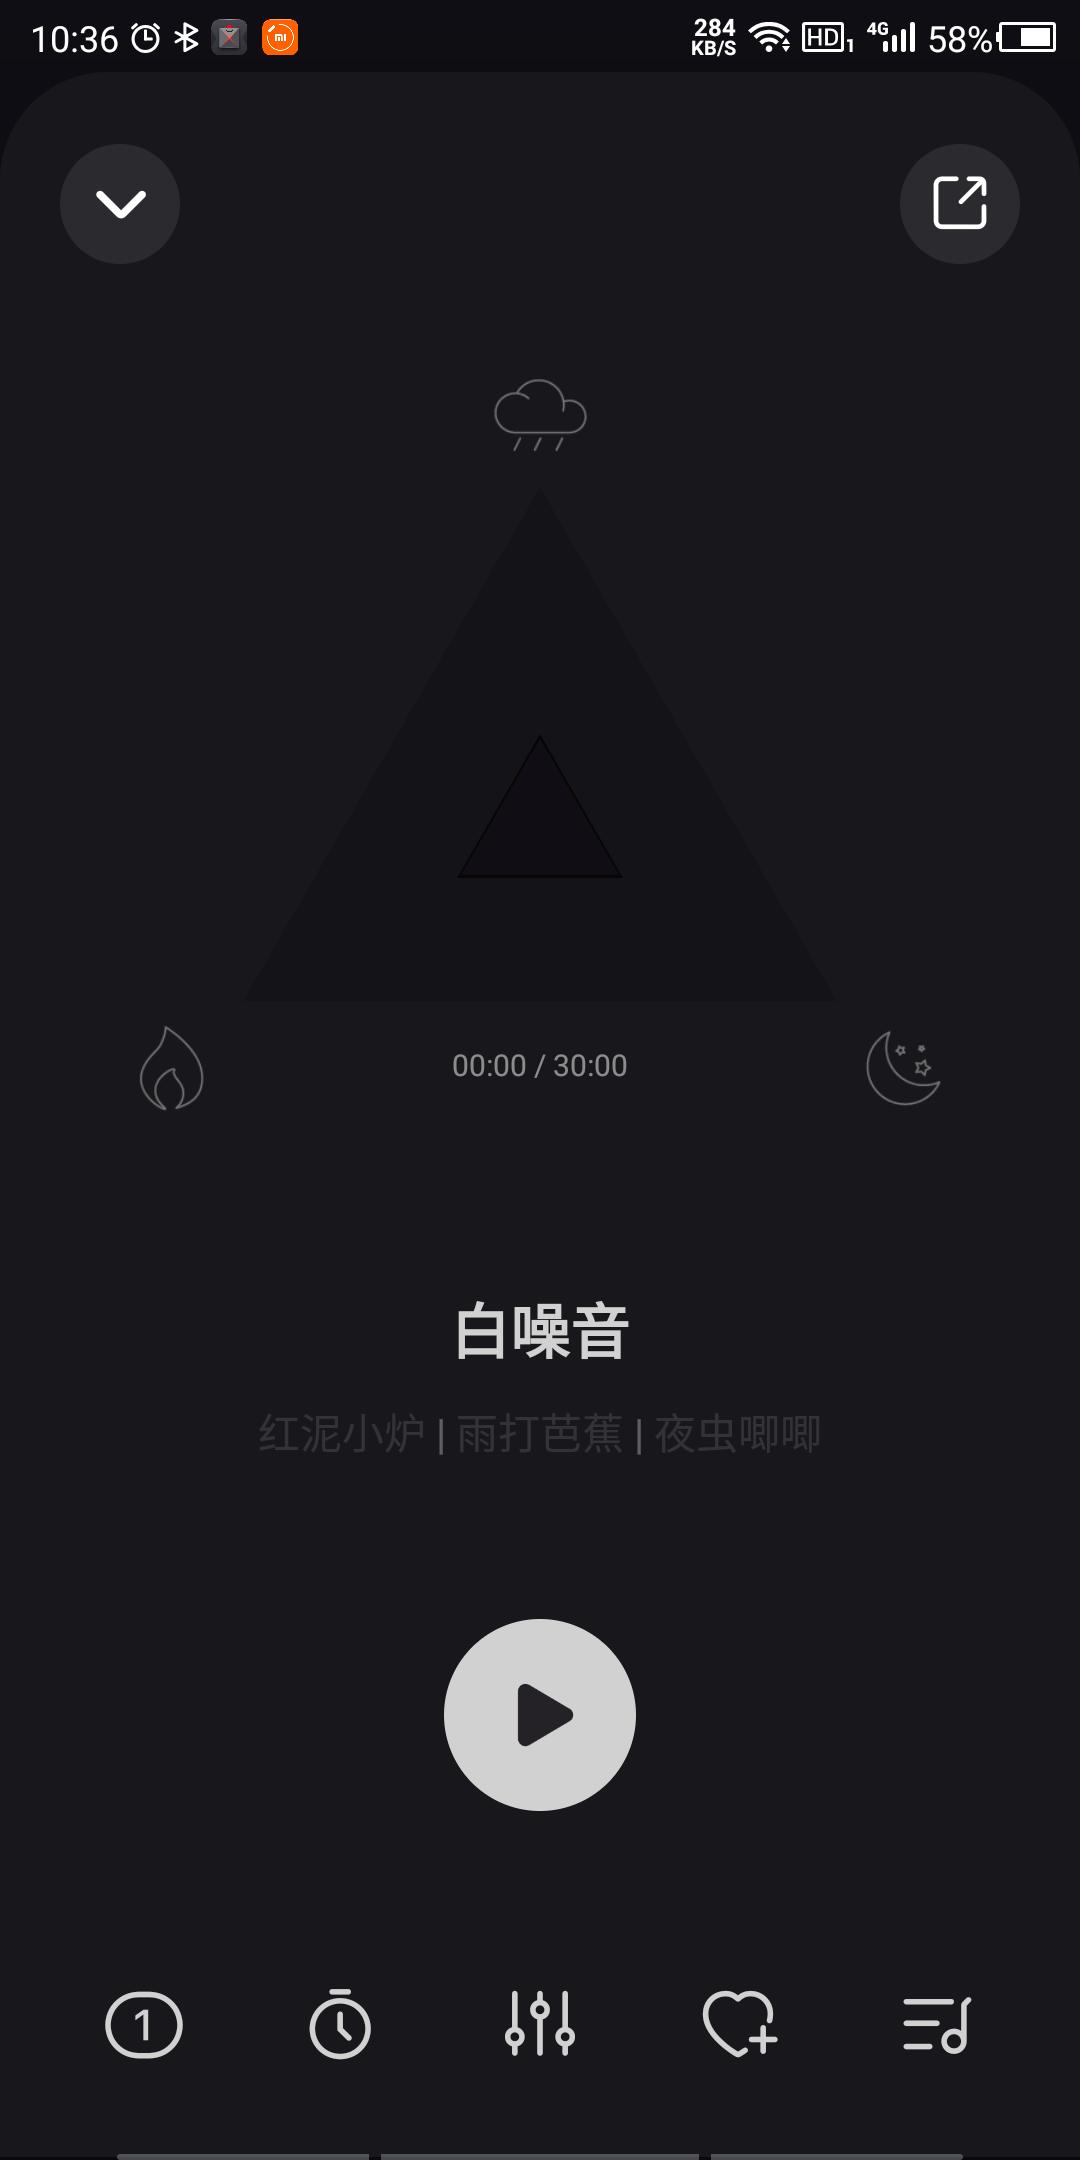 小睡眠 v5.5.0